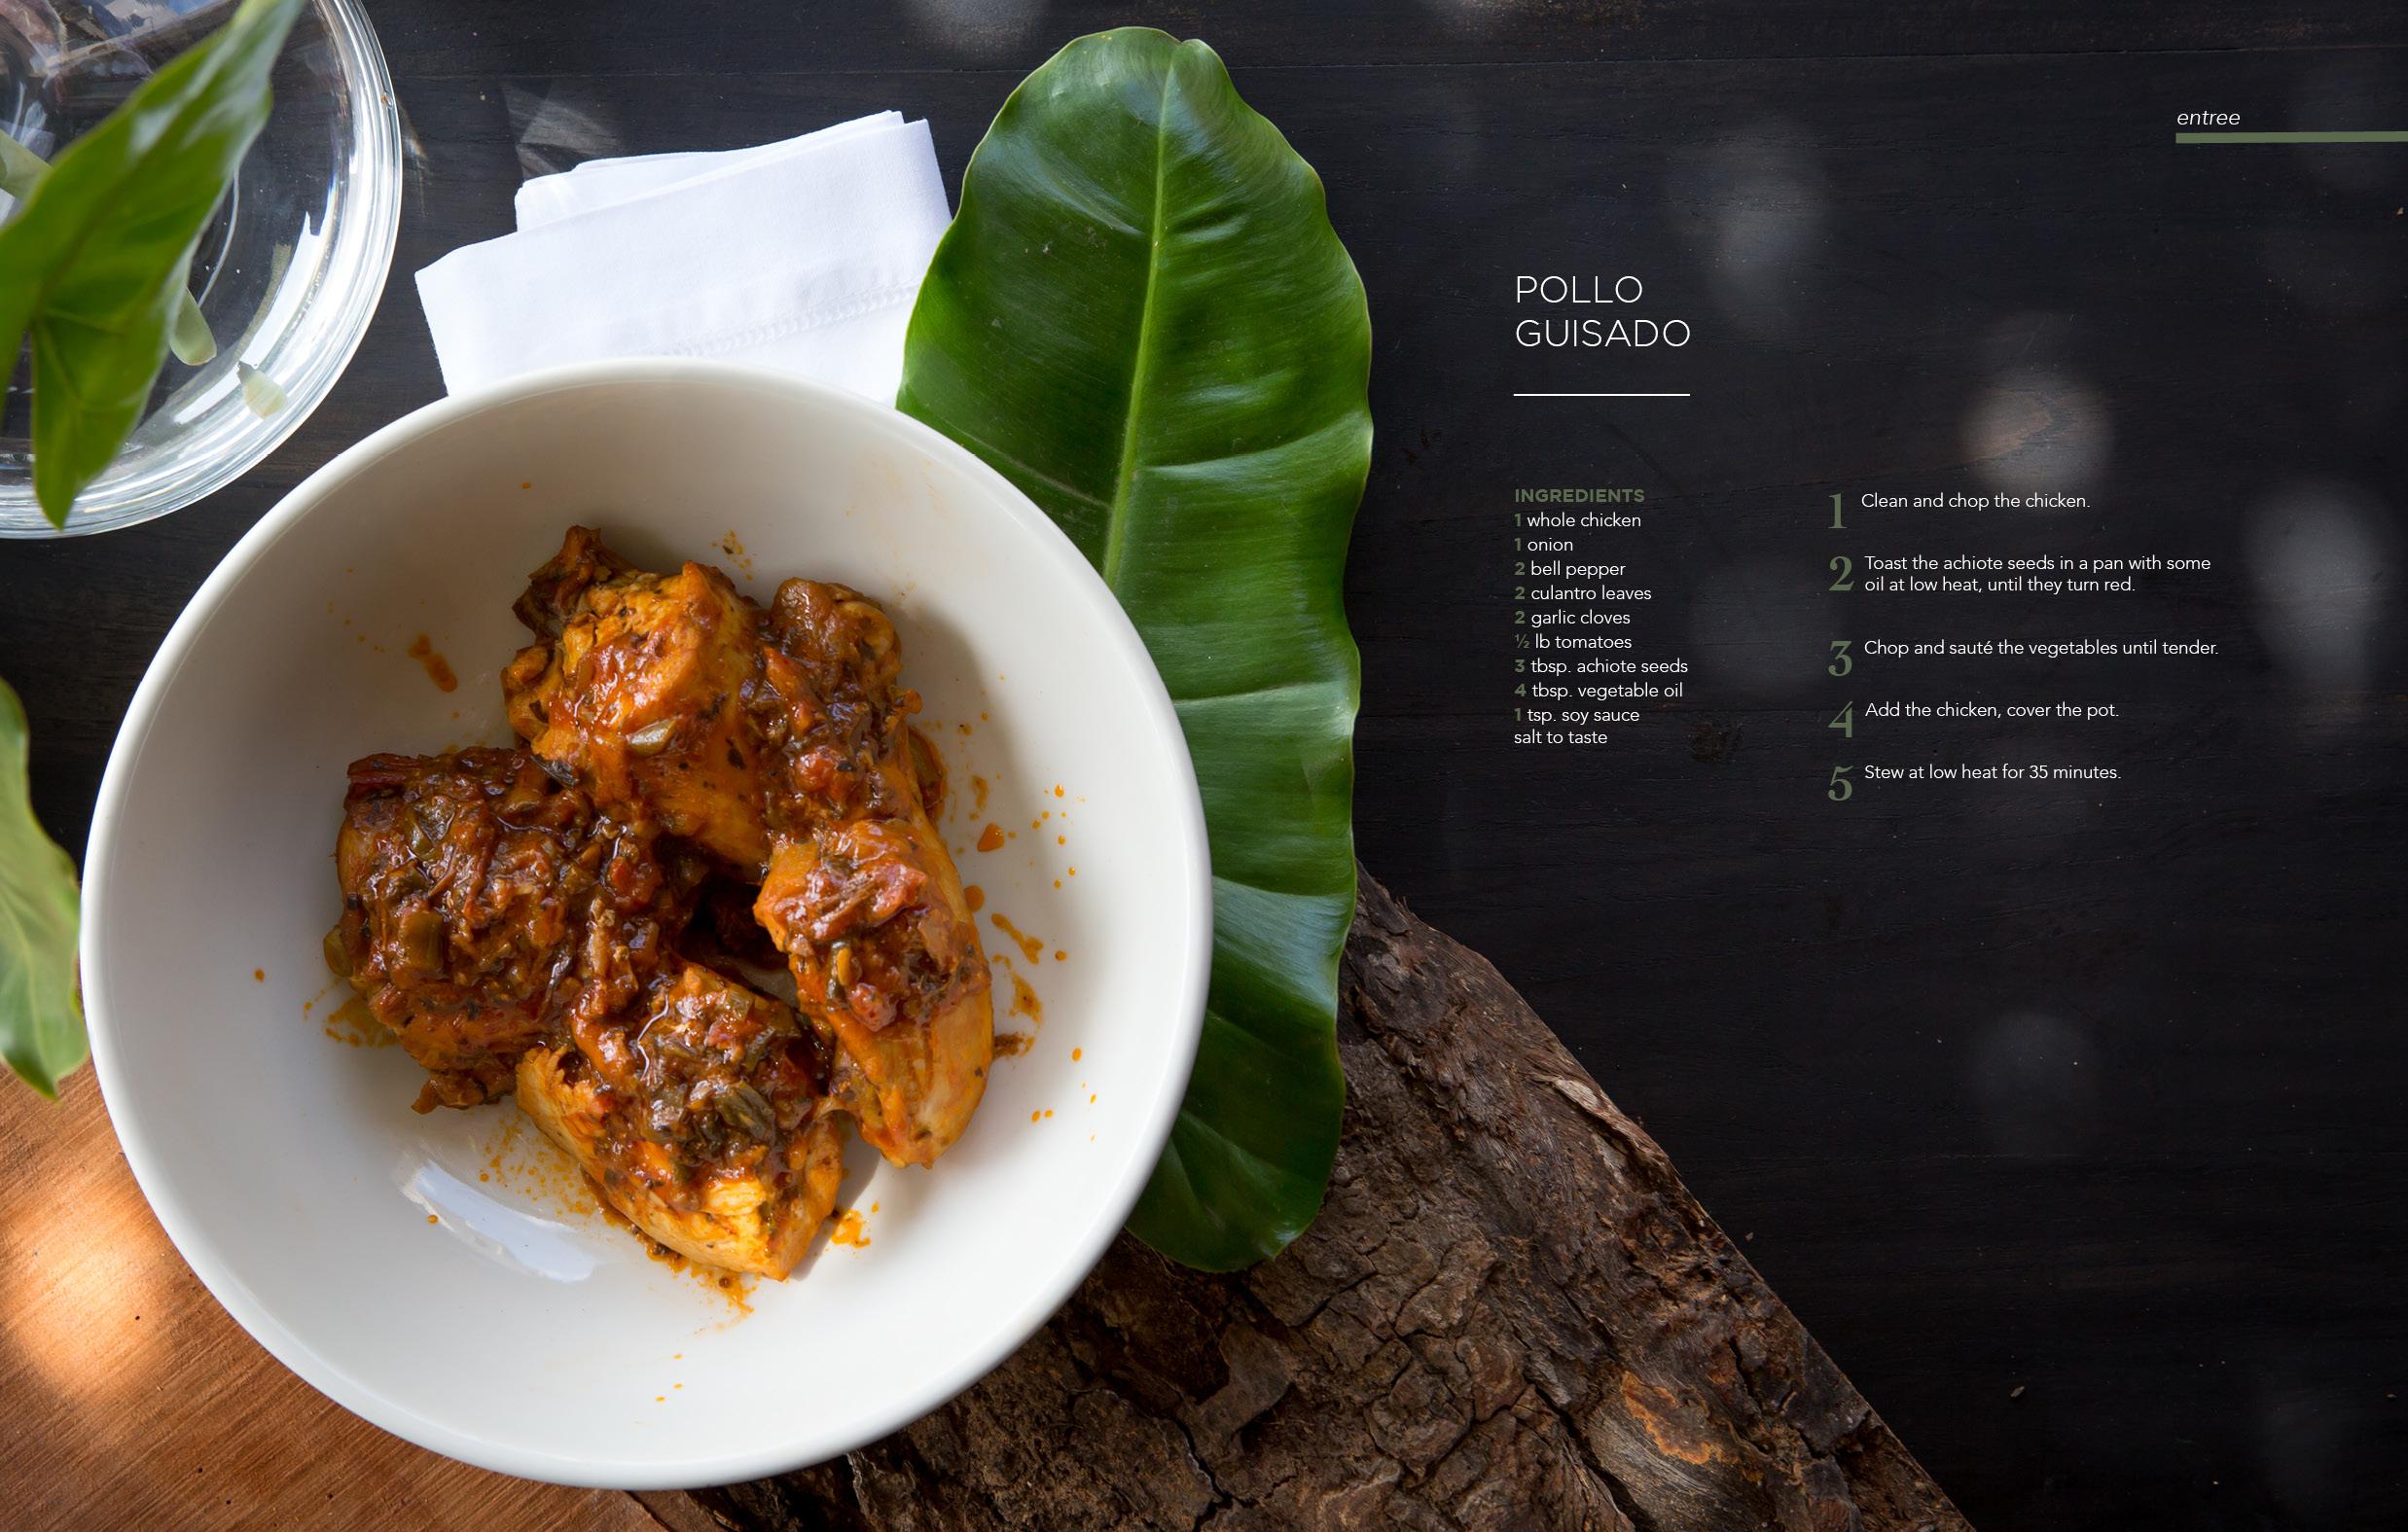 Cookbook Pages 10271838.jpg